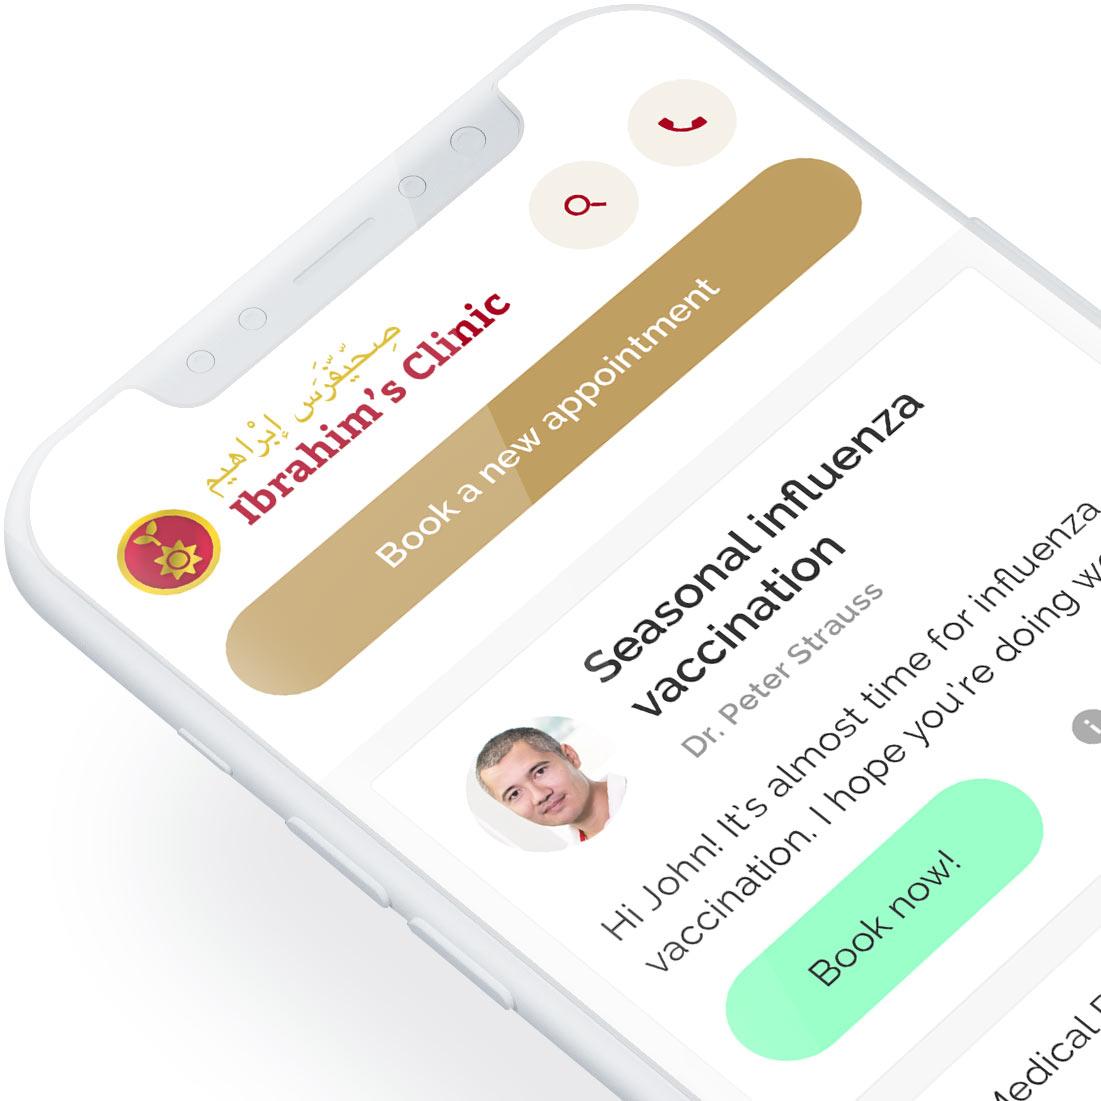 ClinicApp: Terveyskeskuksen UI/UX ja prototyyppi (2018)